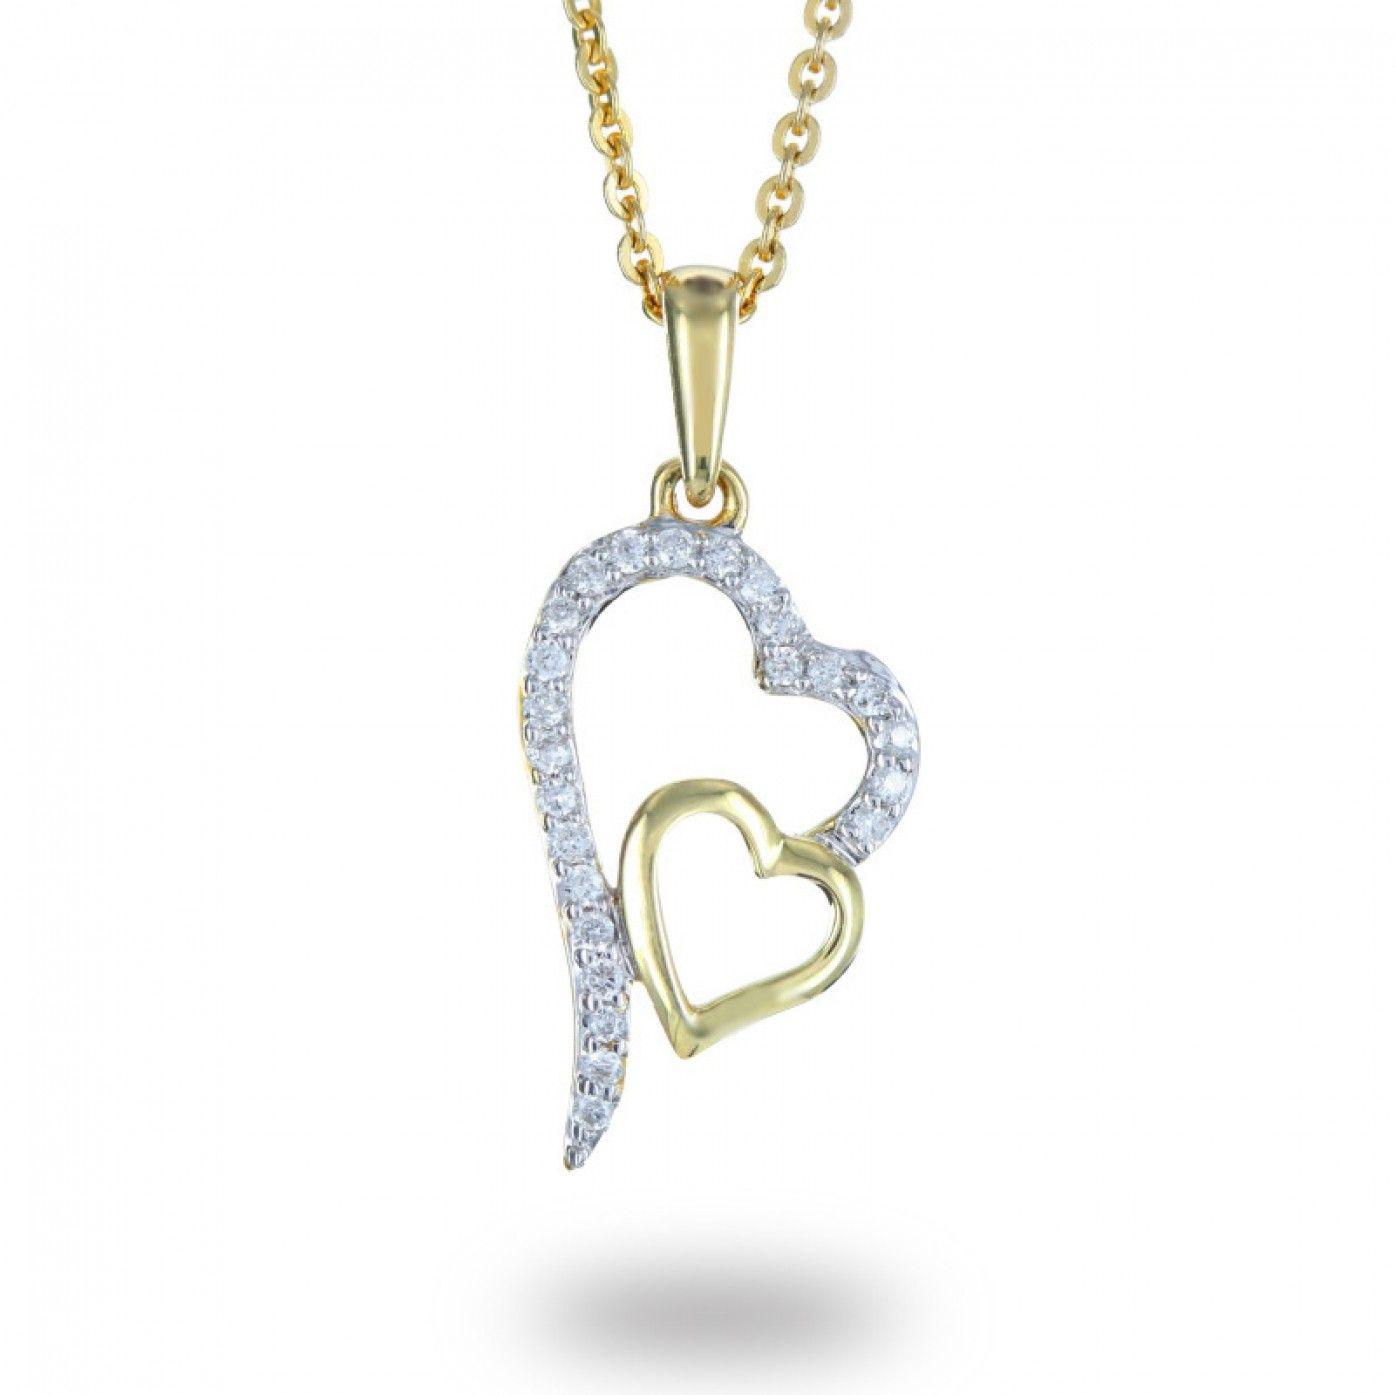 Interlocking heart shape ct diamond pendant in k yellow gold